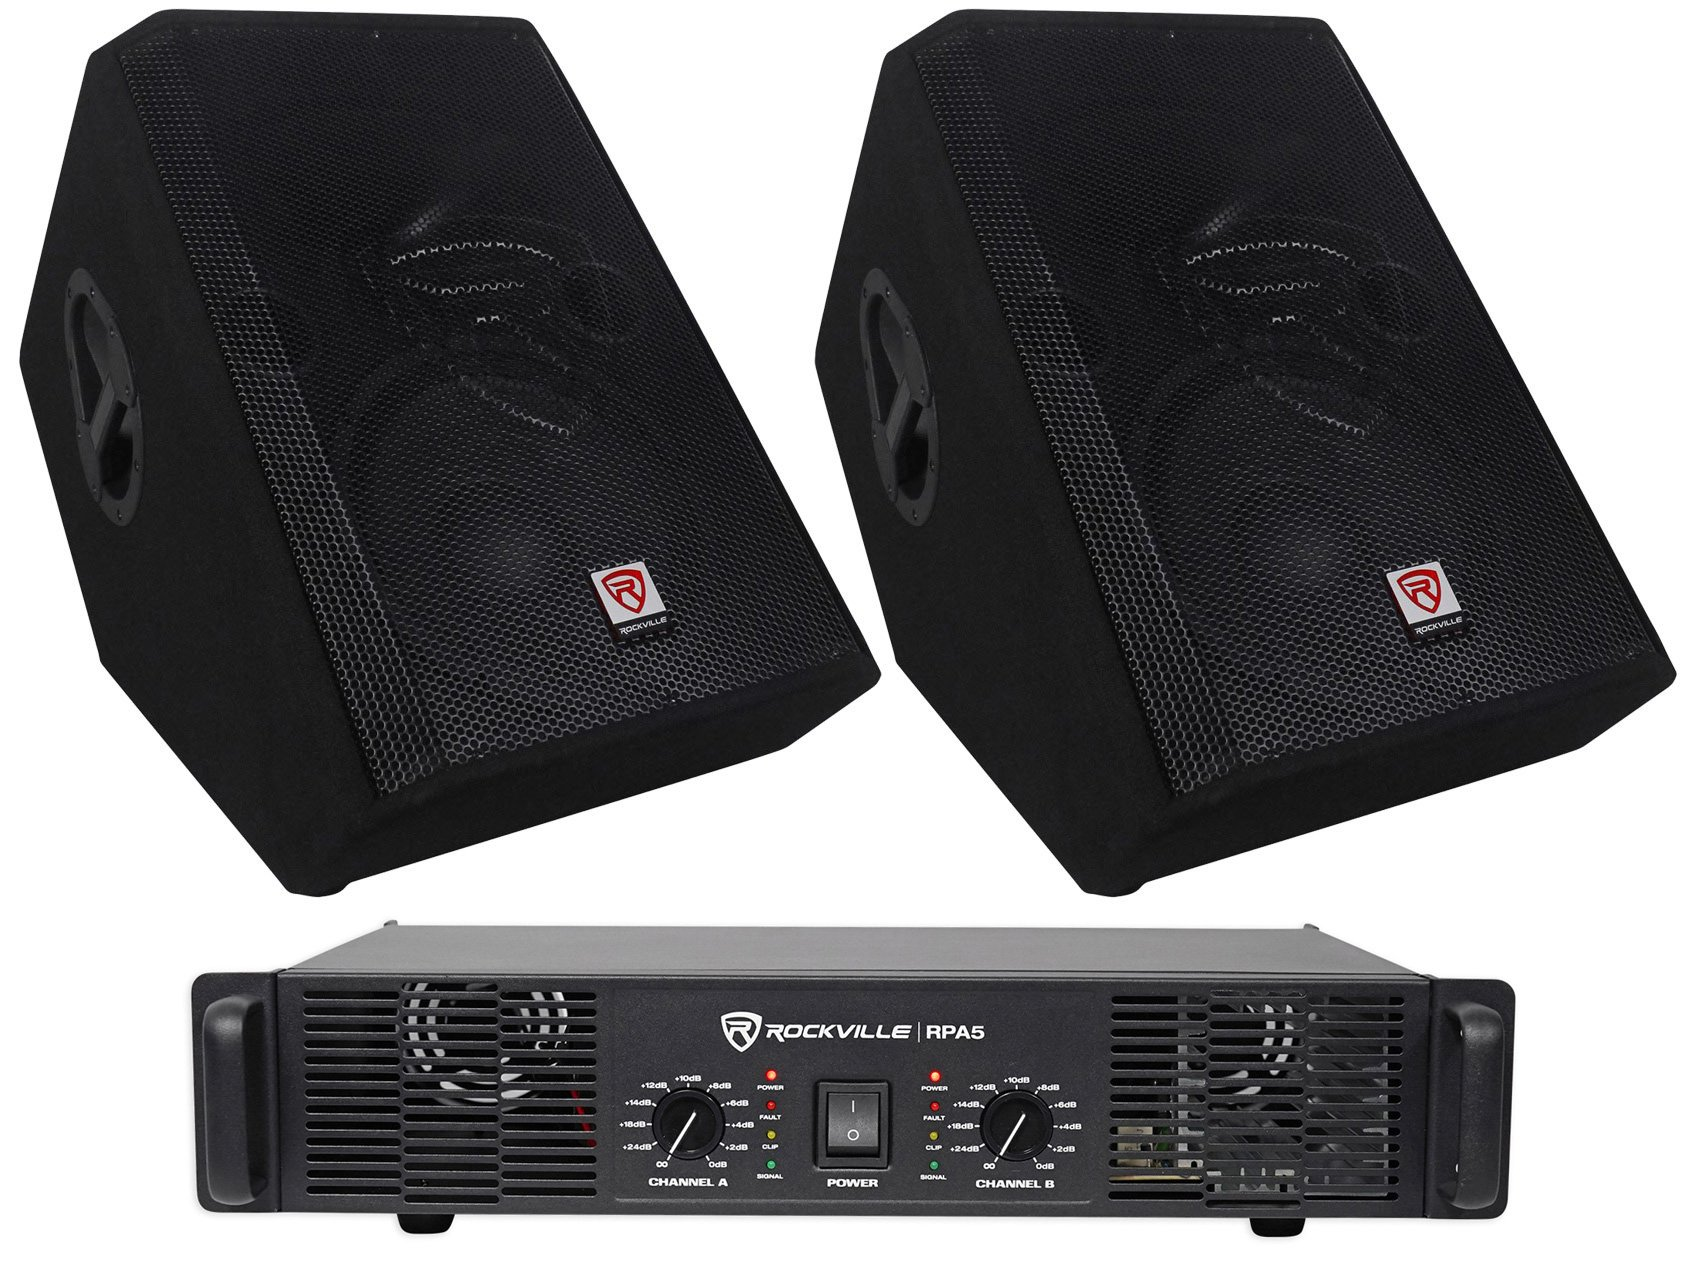 2) Rockville RSM12P 12'' 2000 Watt Passive Stage Floor Monitor Speakers+Amplifier by Rockville